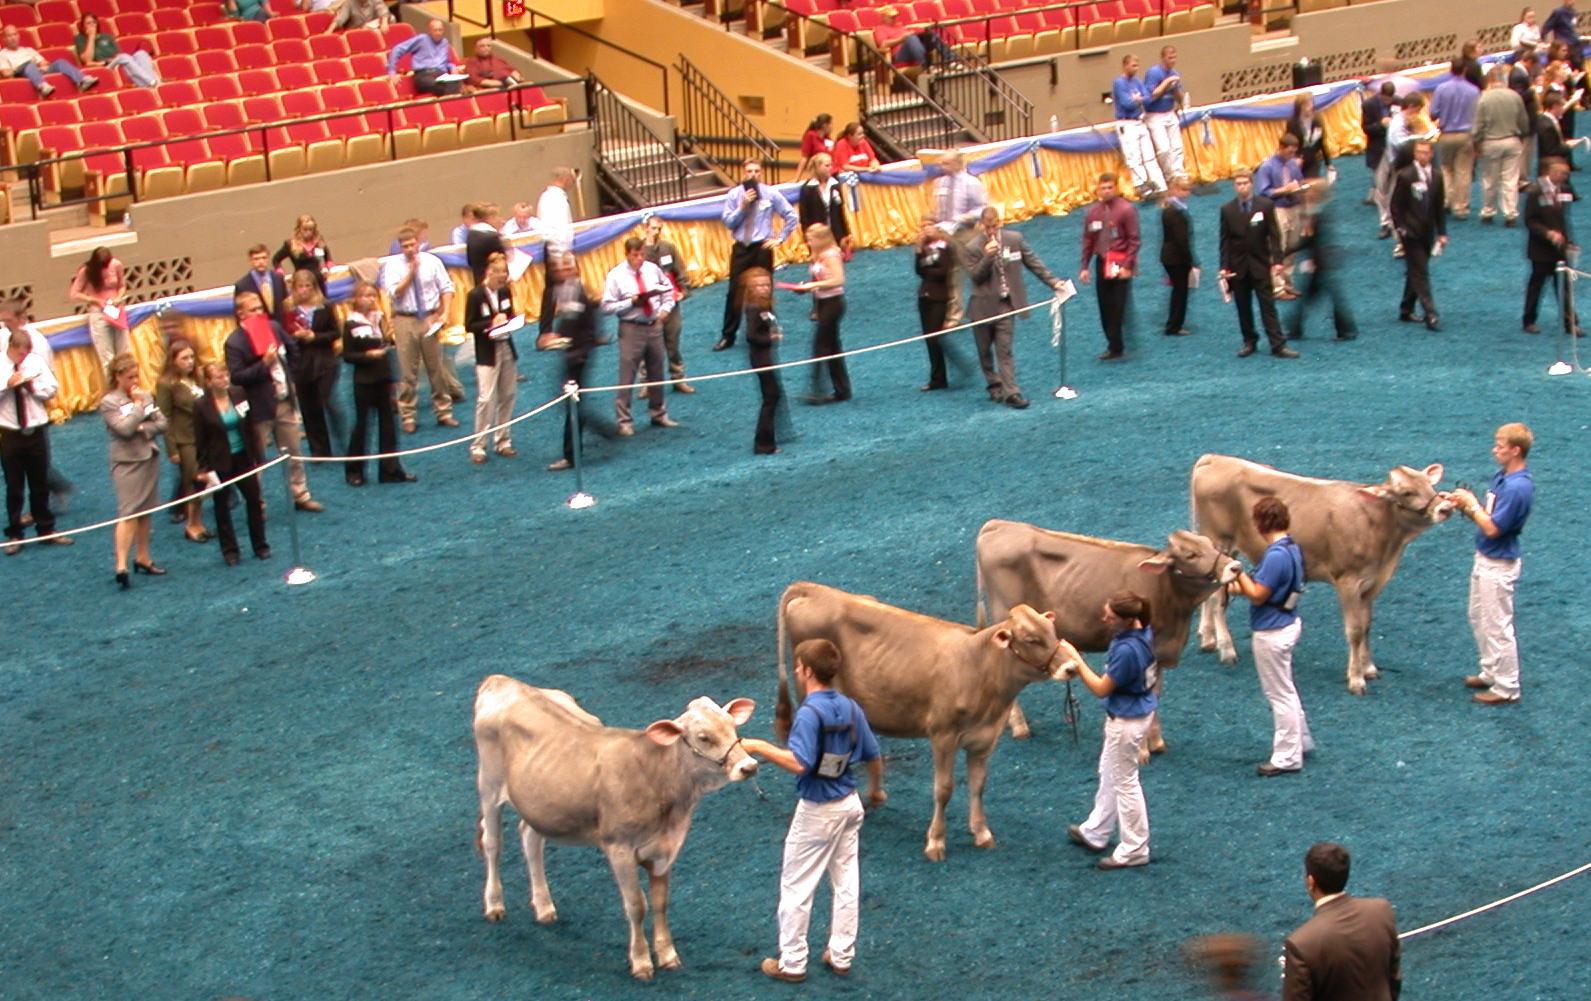 World Dairy Expo, Intercollegiate Dairy Cattle Judging